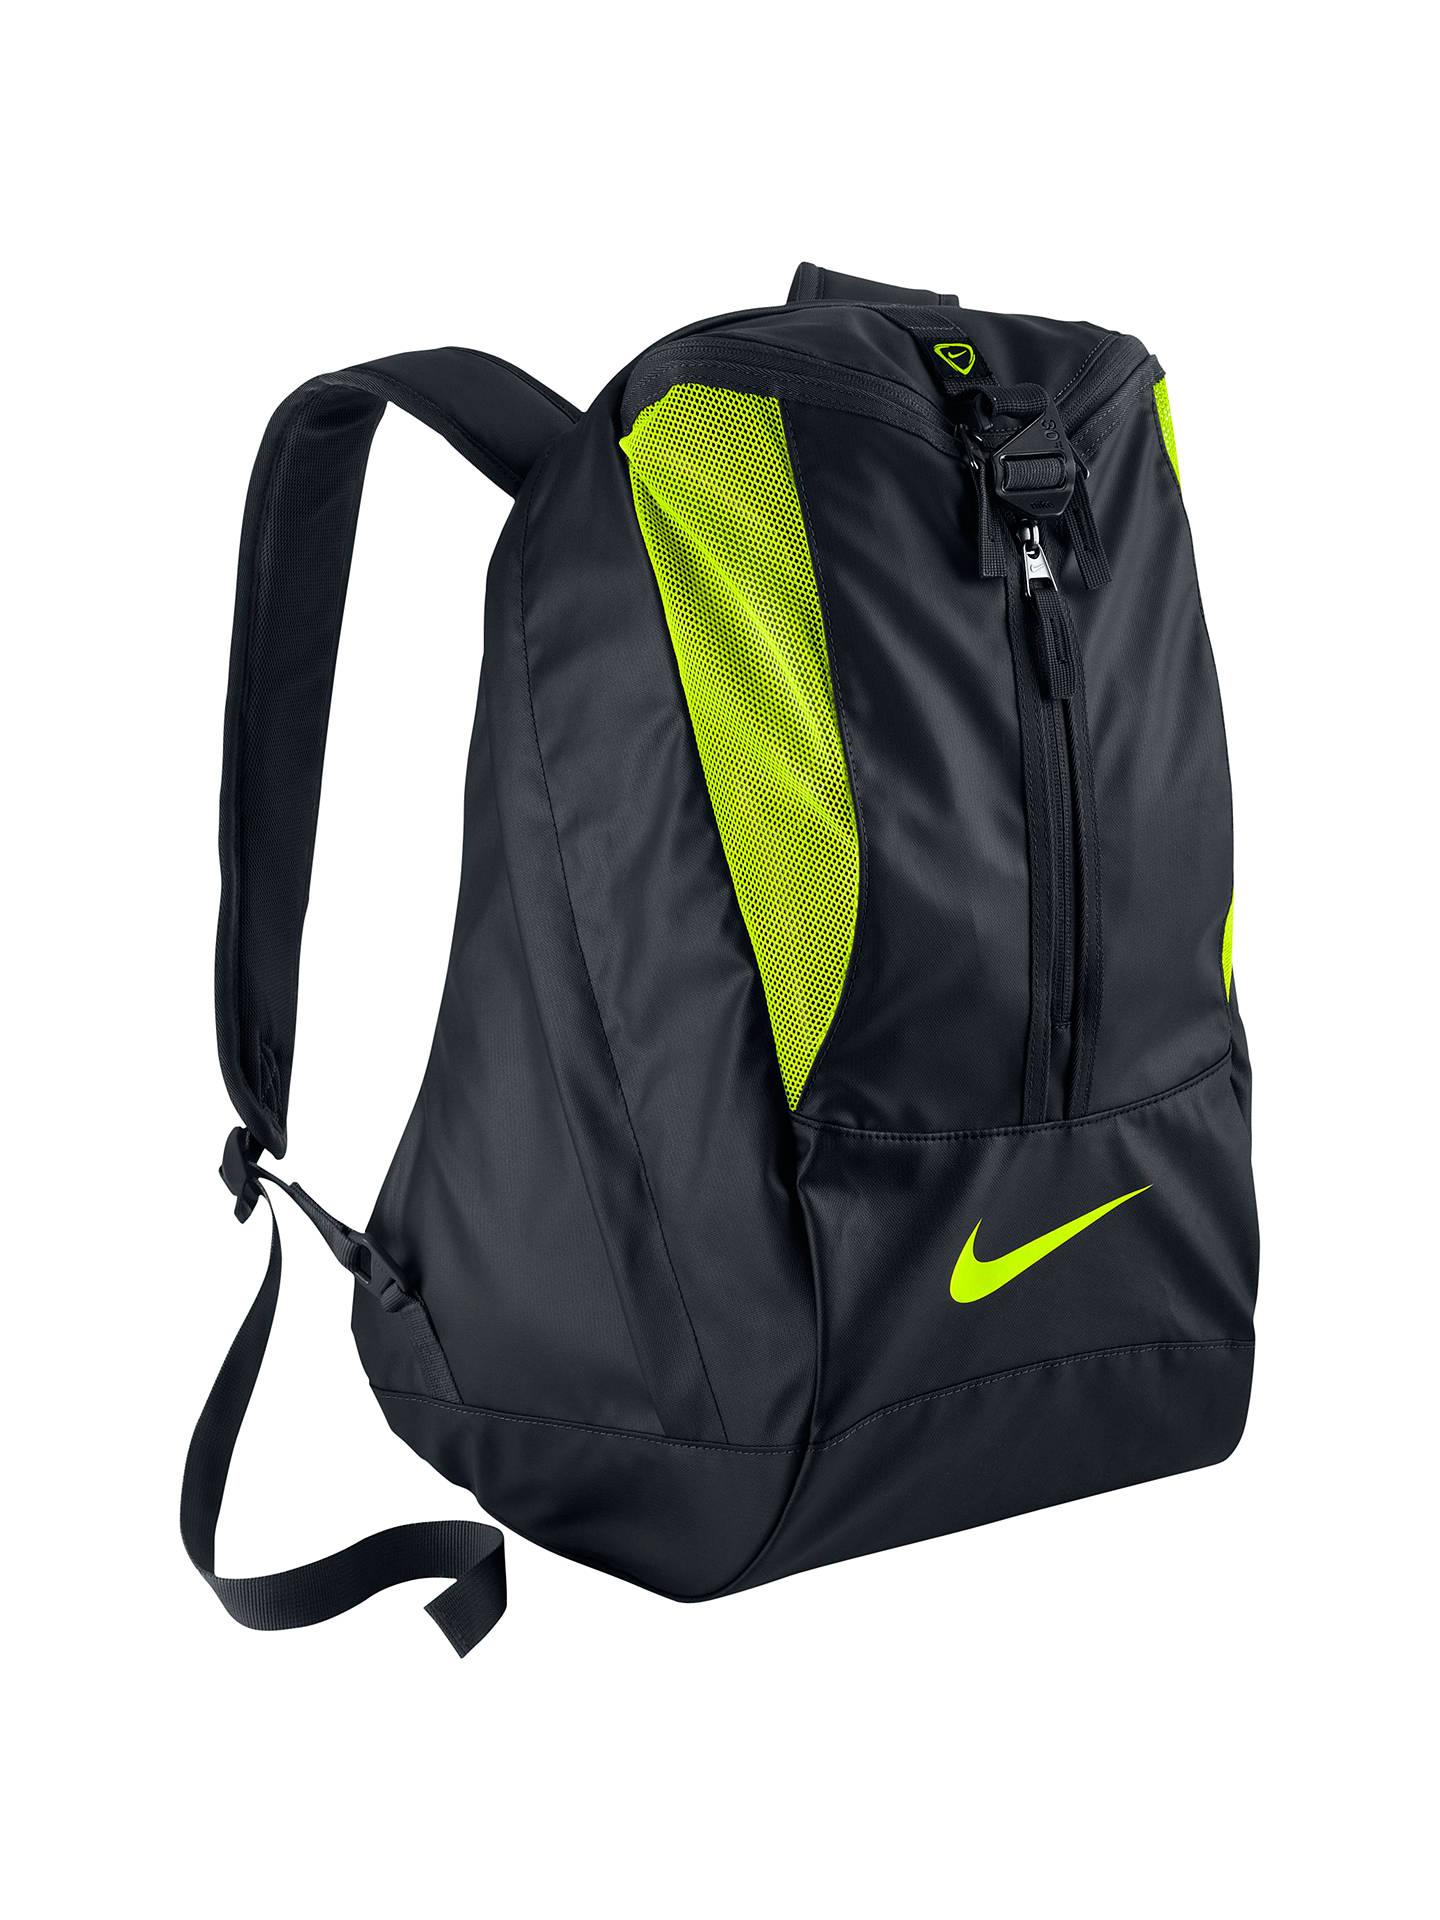 Señuelo Reducción Mecánico  Nike Football Shield Backpack, Black at John Lewis & Partners